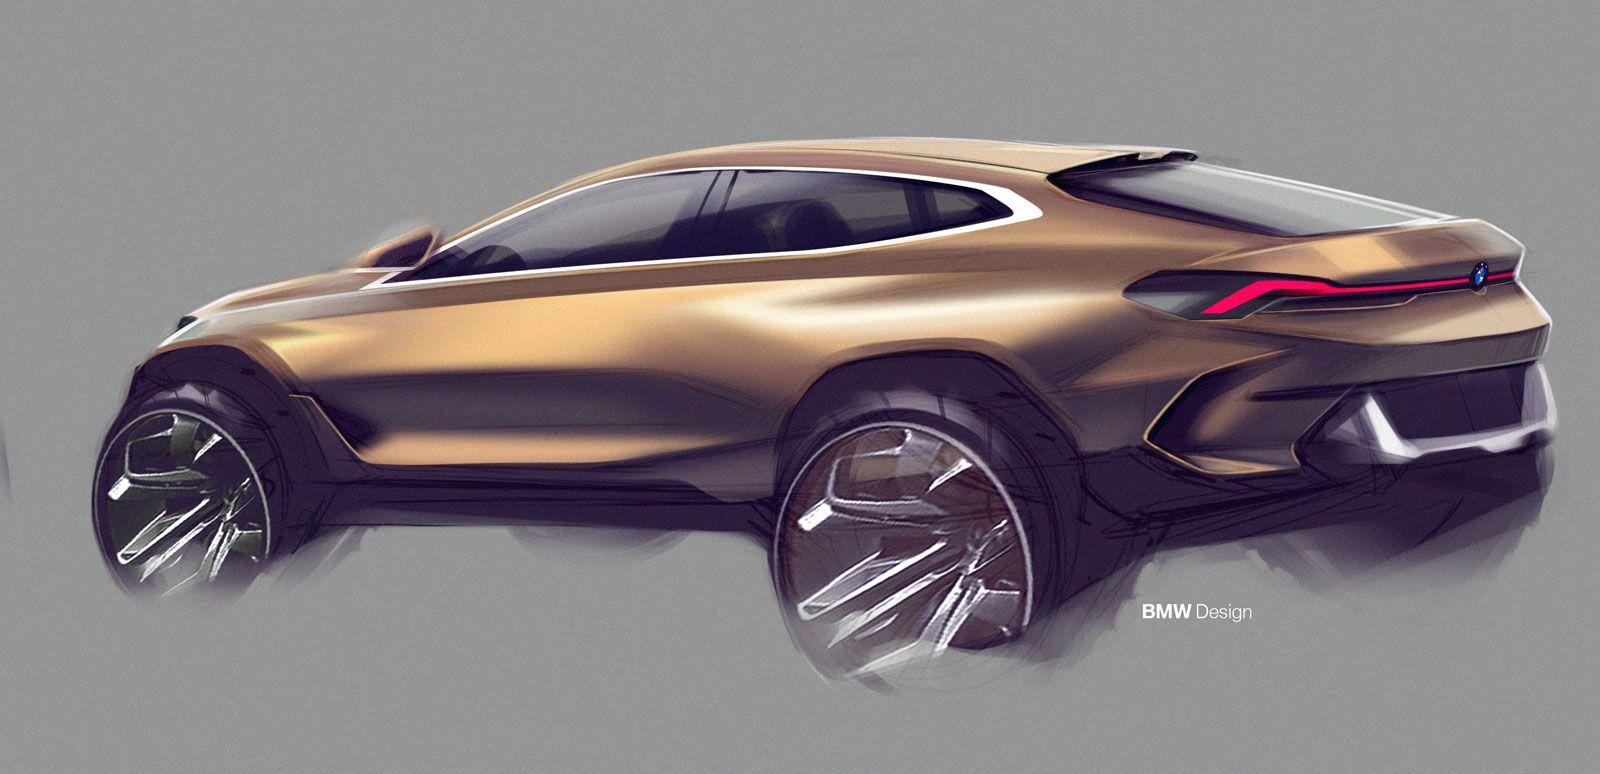 New Bmw X6 Design Sketch 2020